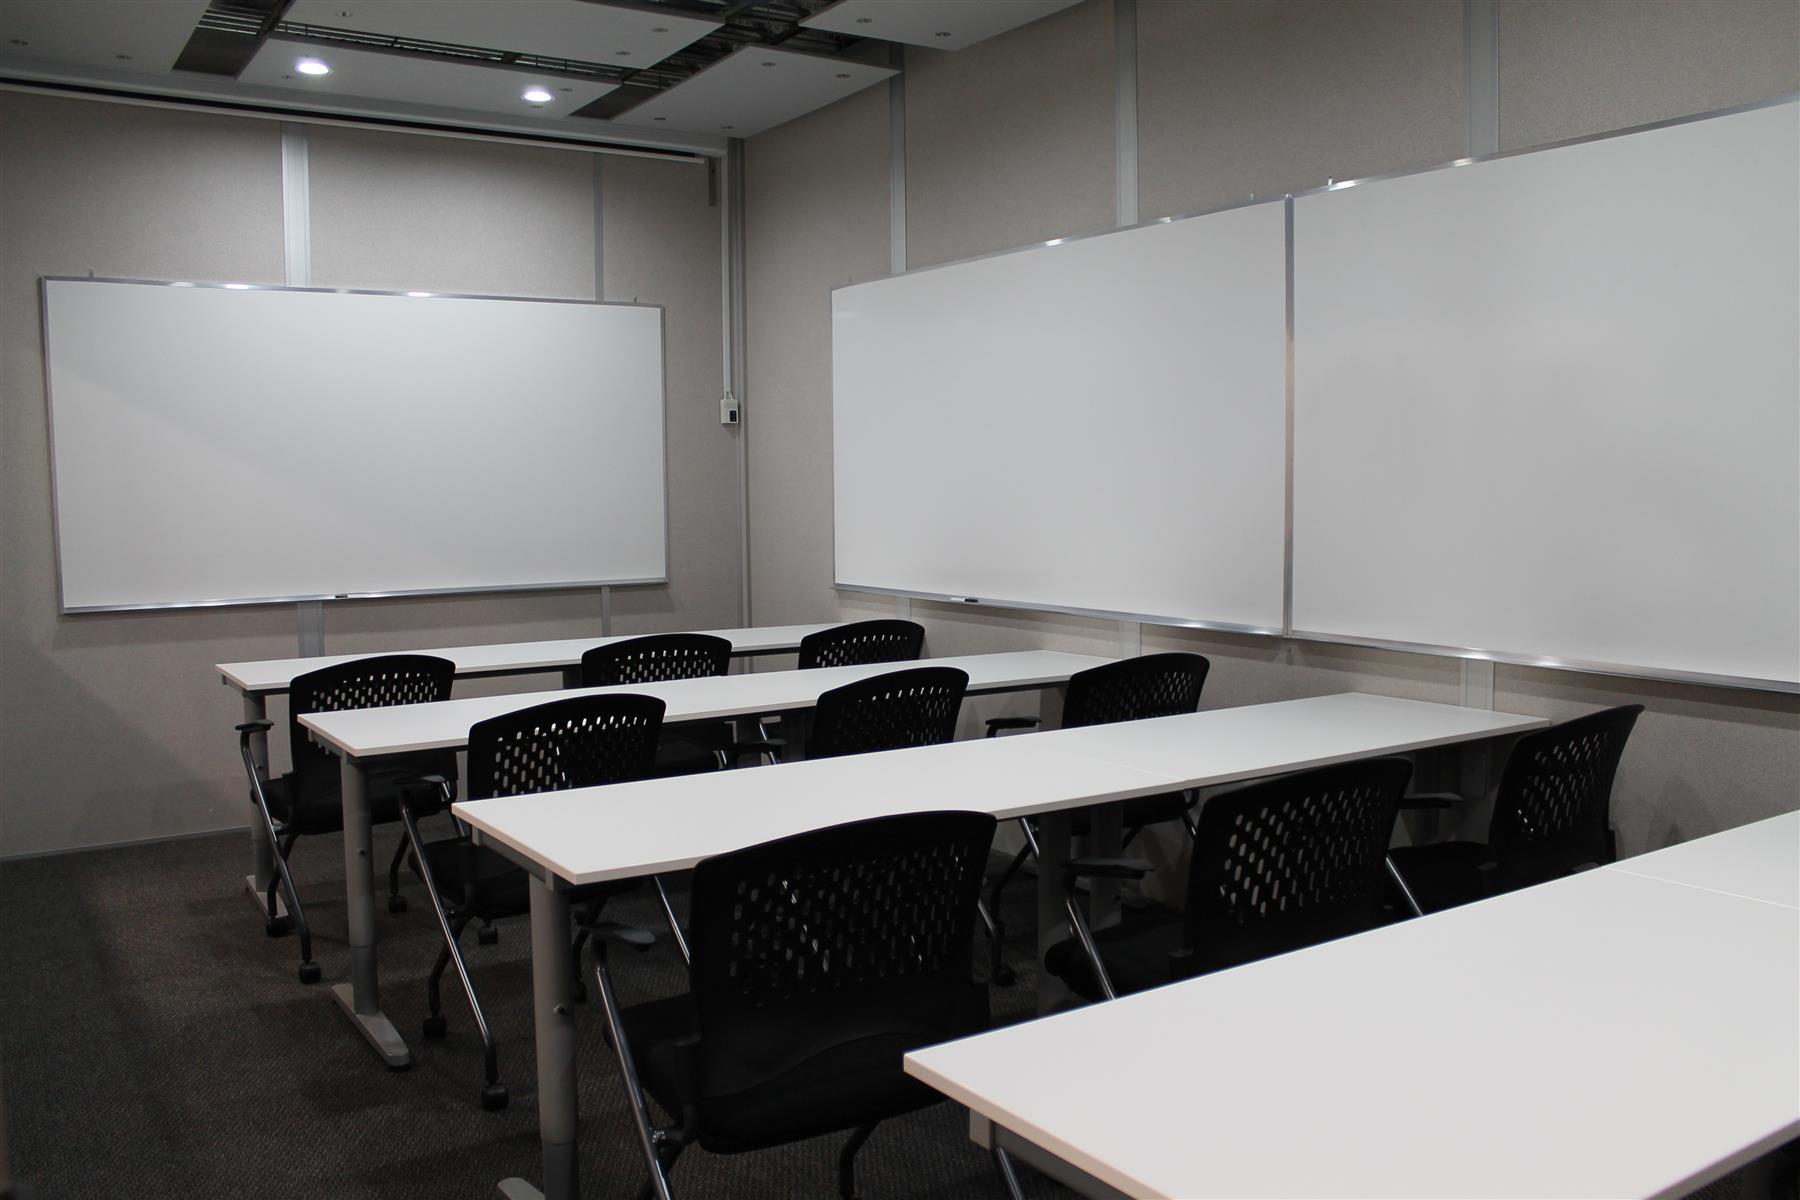 Pro Desk Space - Conference Room